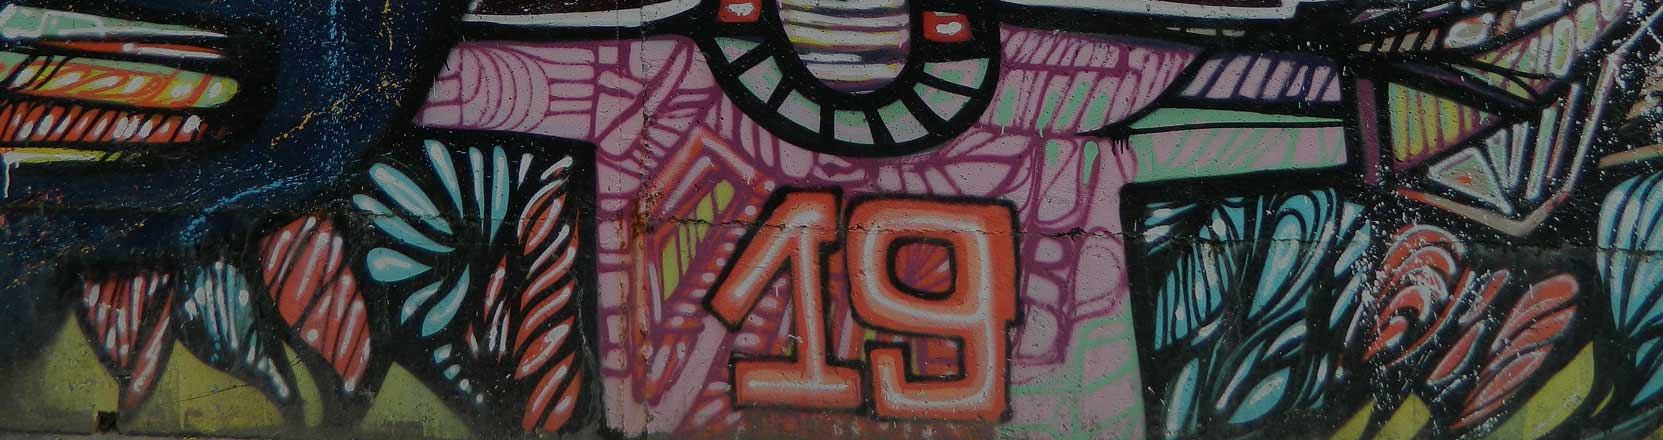 artistes urbains paris